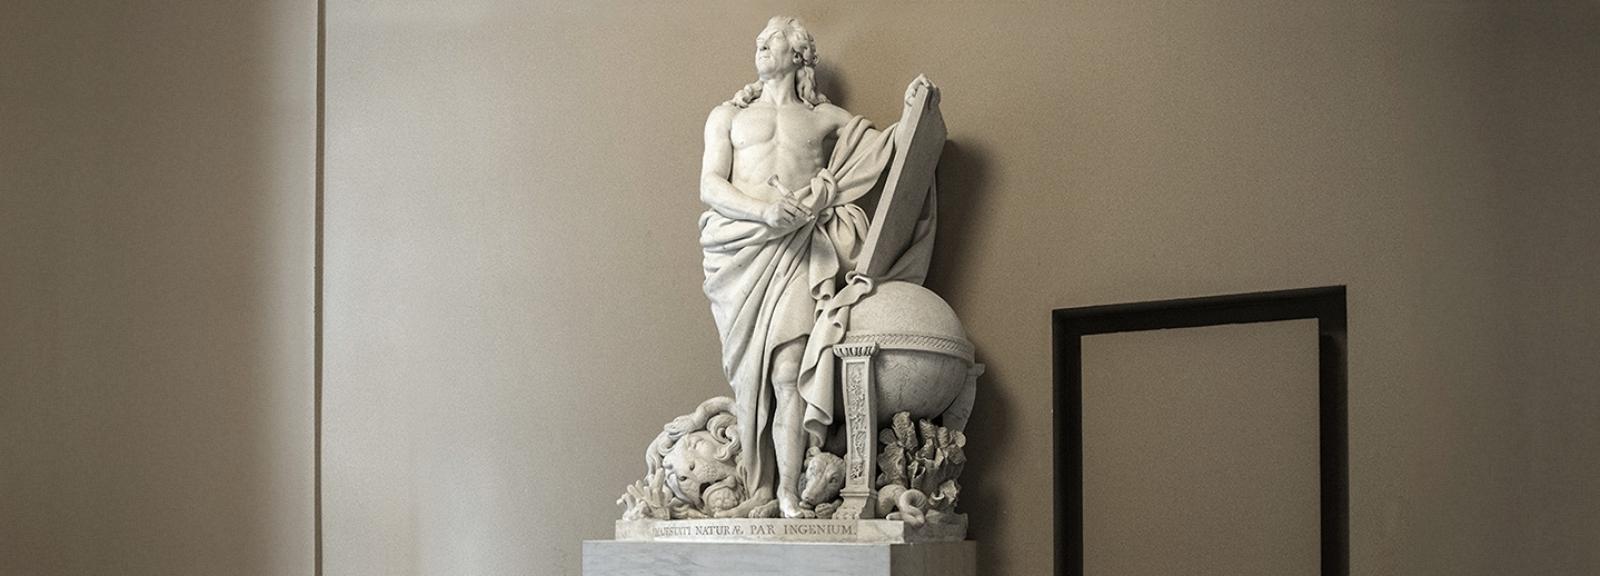 Georges-Louis Leclerc, comte de Buffon © MNHN - Bruno Jay